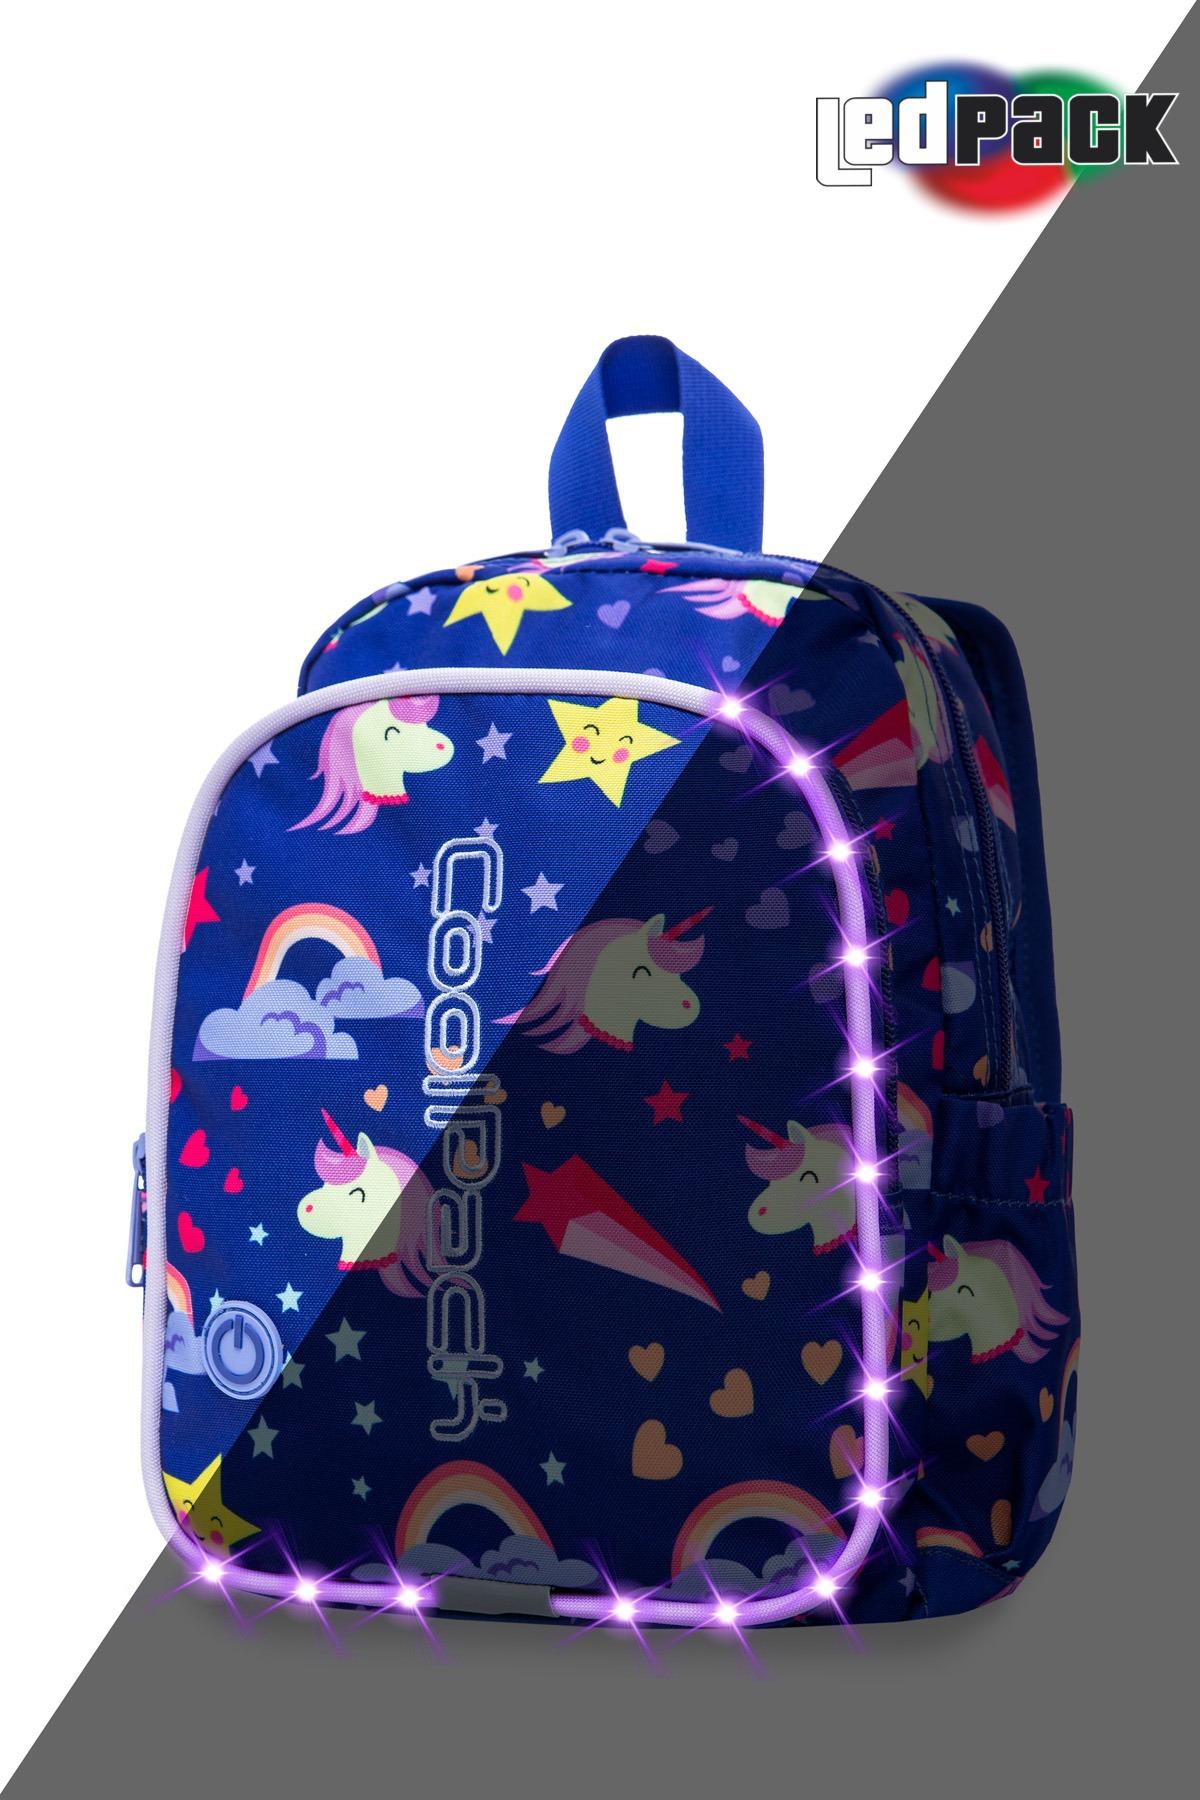 Coolpack   bobby   børne rygsæk   led unicorns